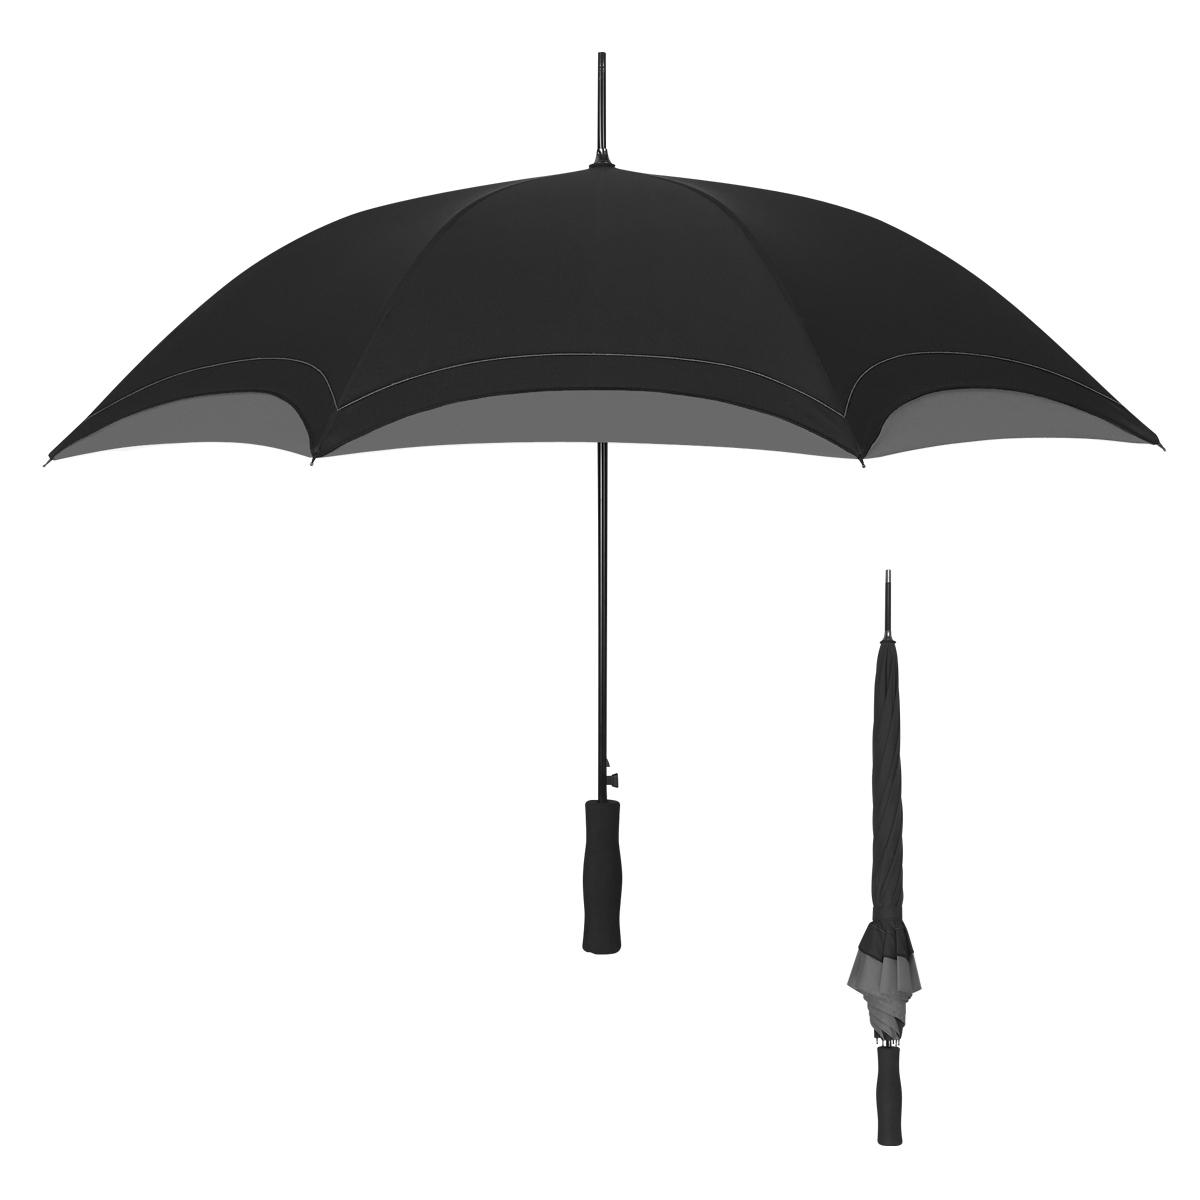 4131 - Paraguas arco